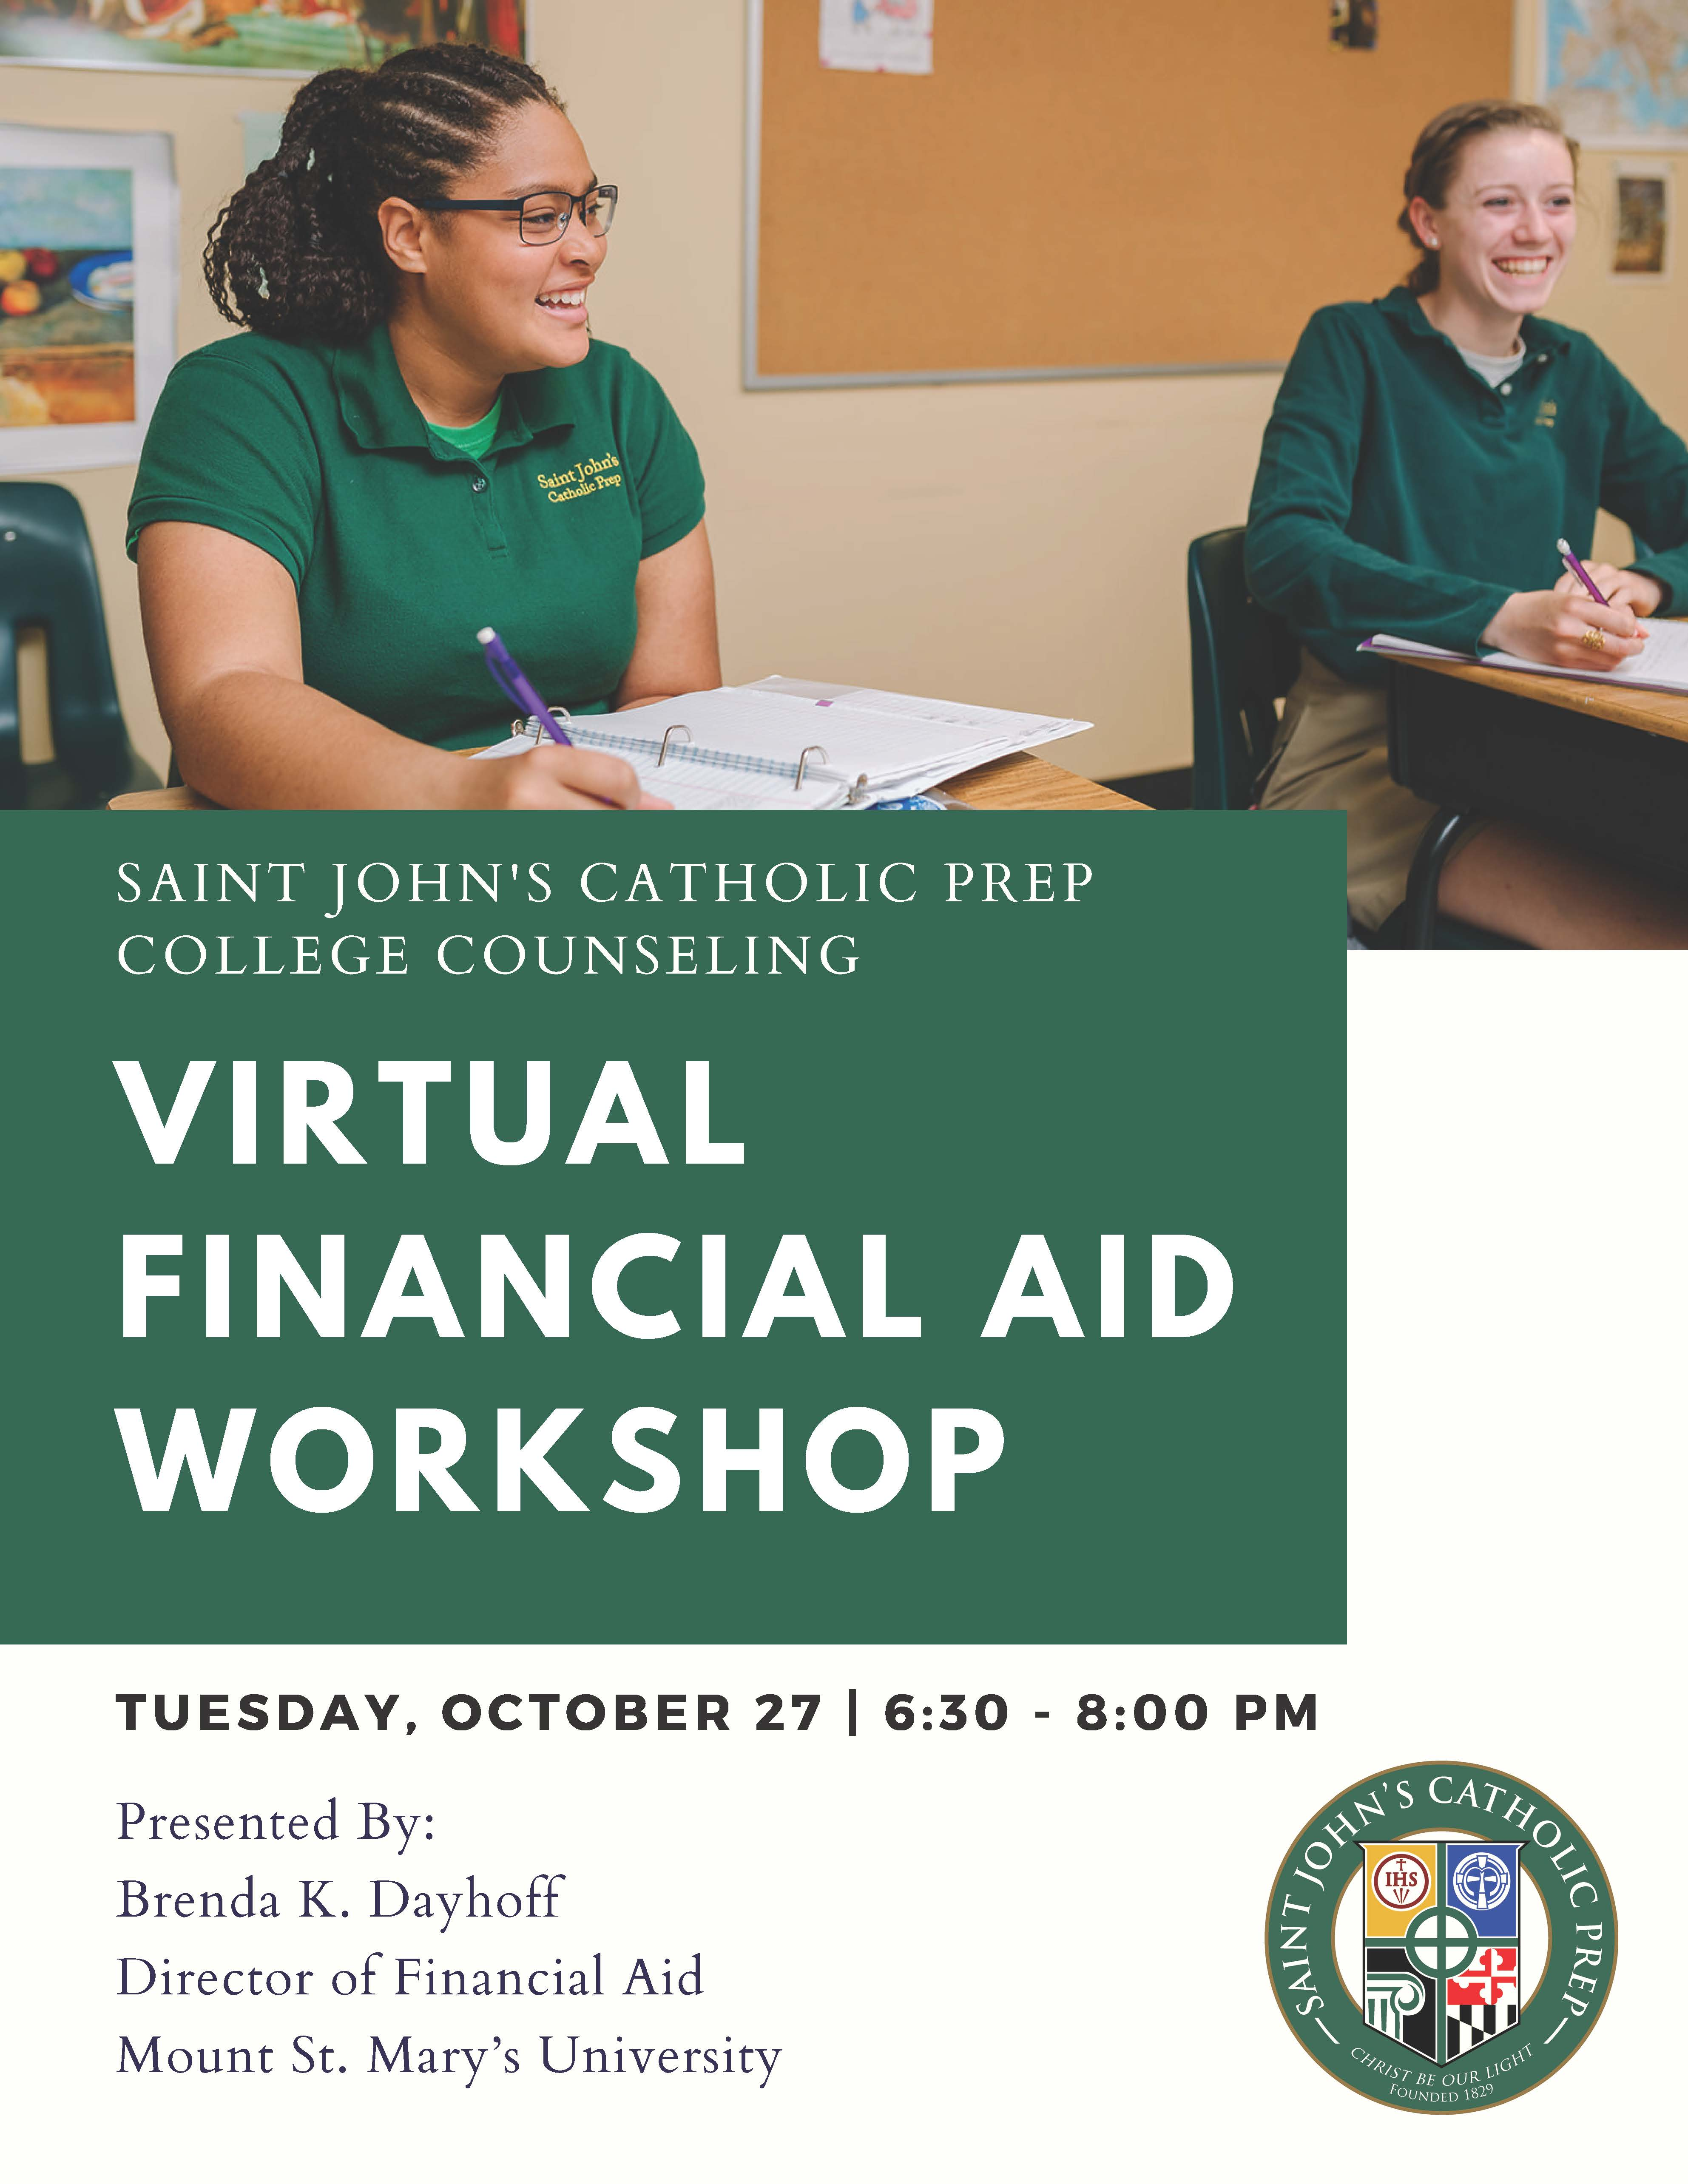 College Financial Aid Workshop October 27, 2020